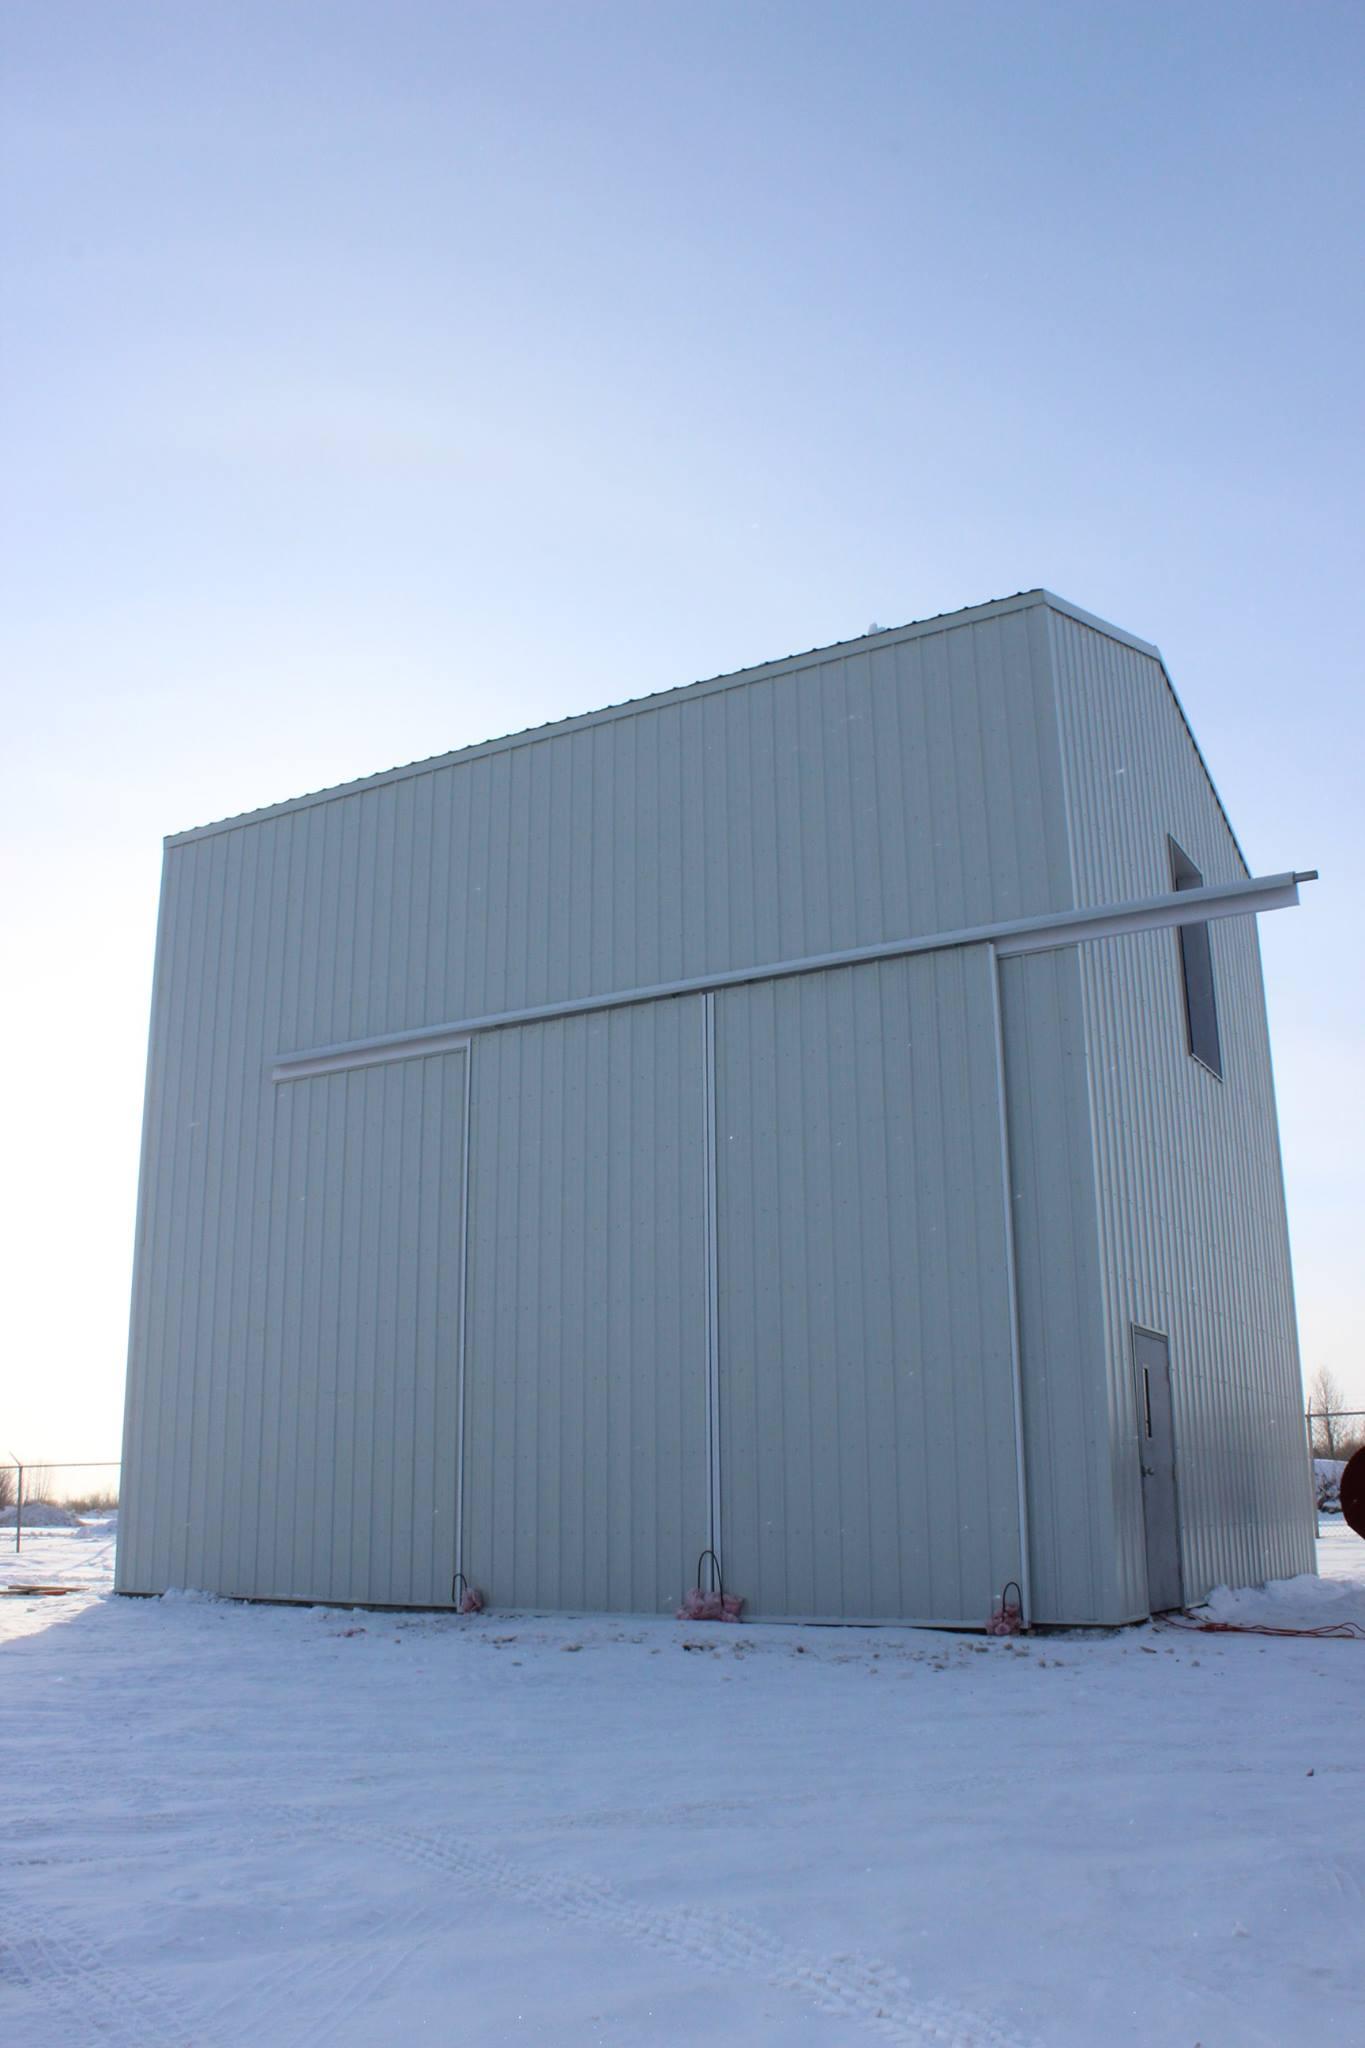 Seed Treatment Facility